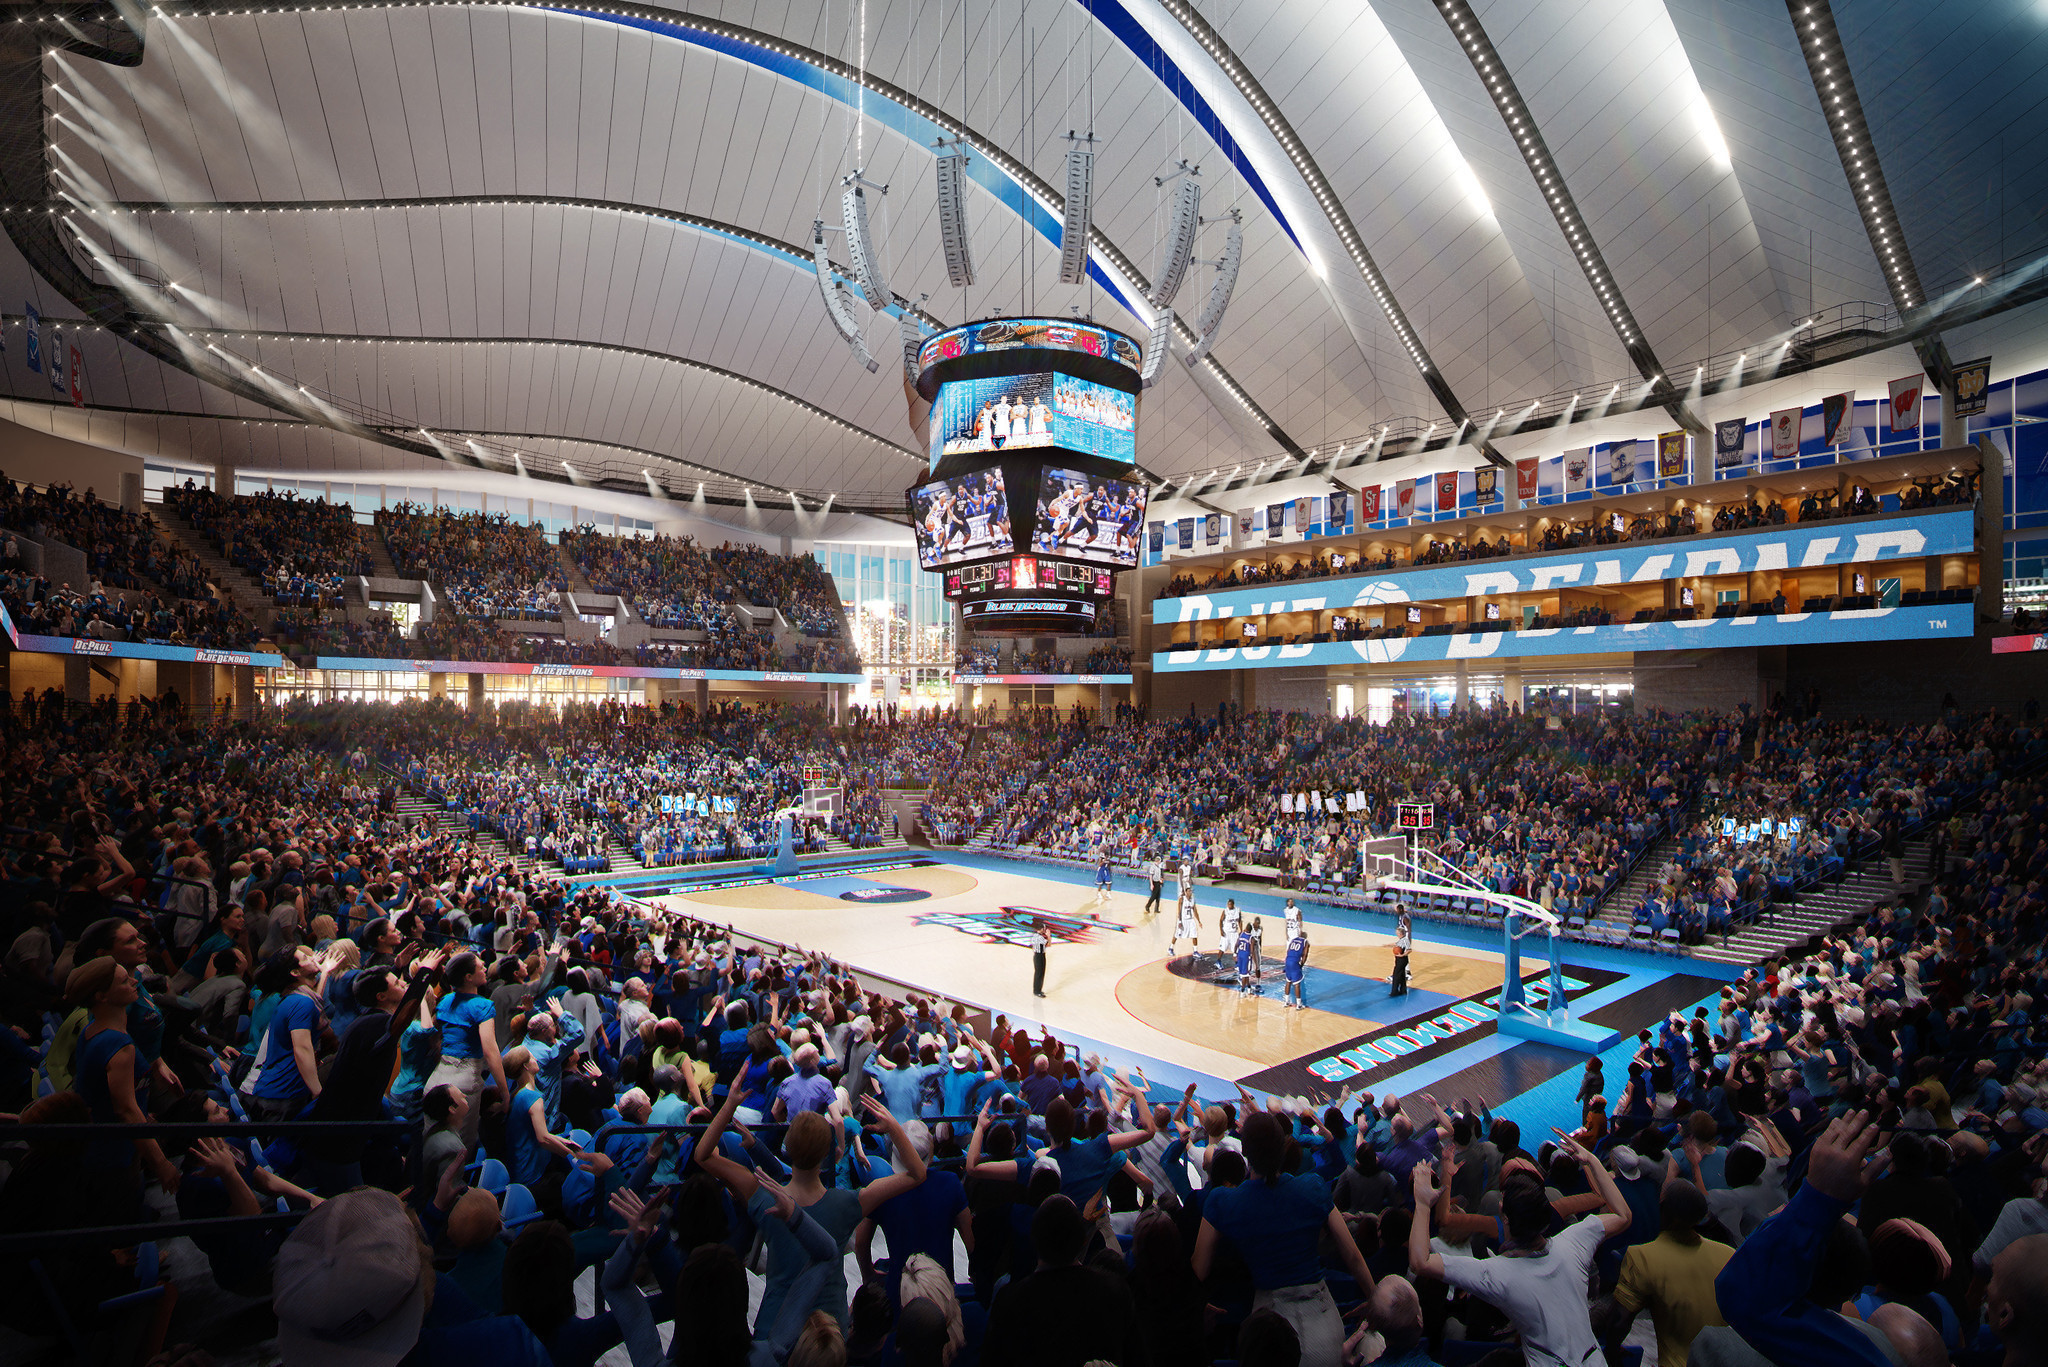 DePaul University Stadium